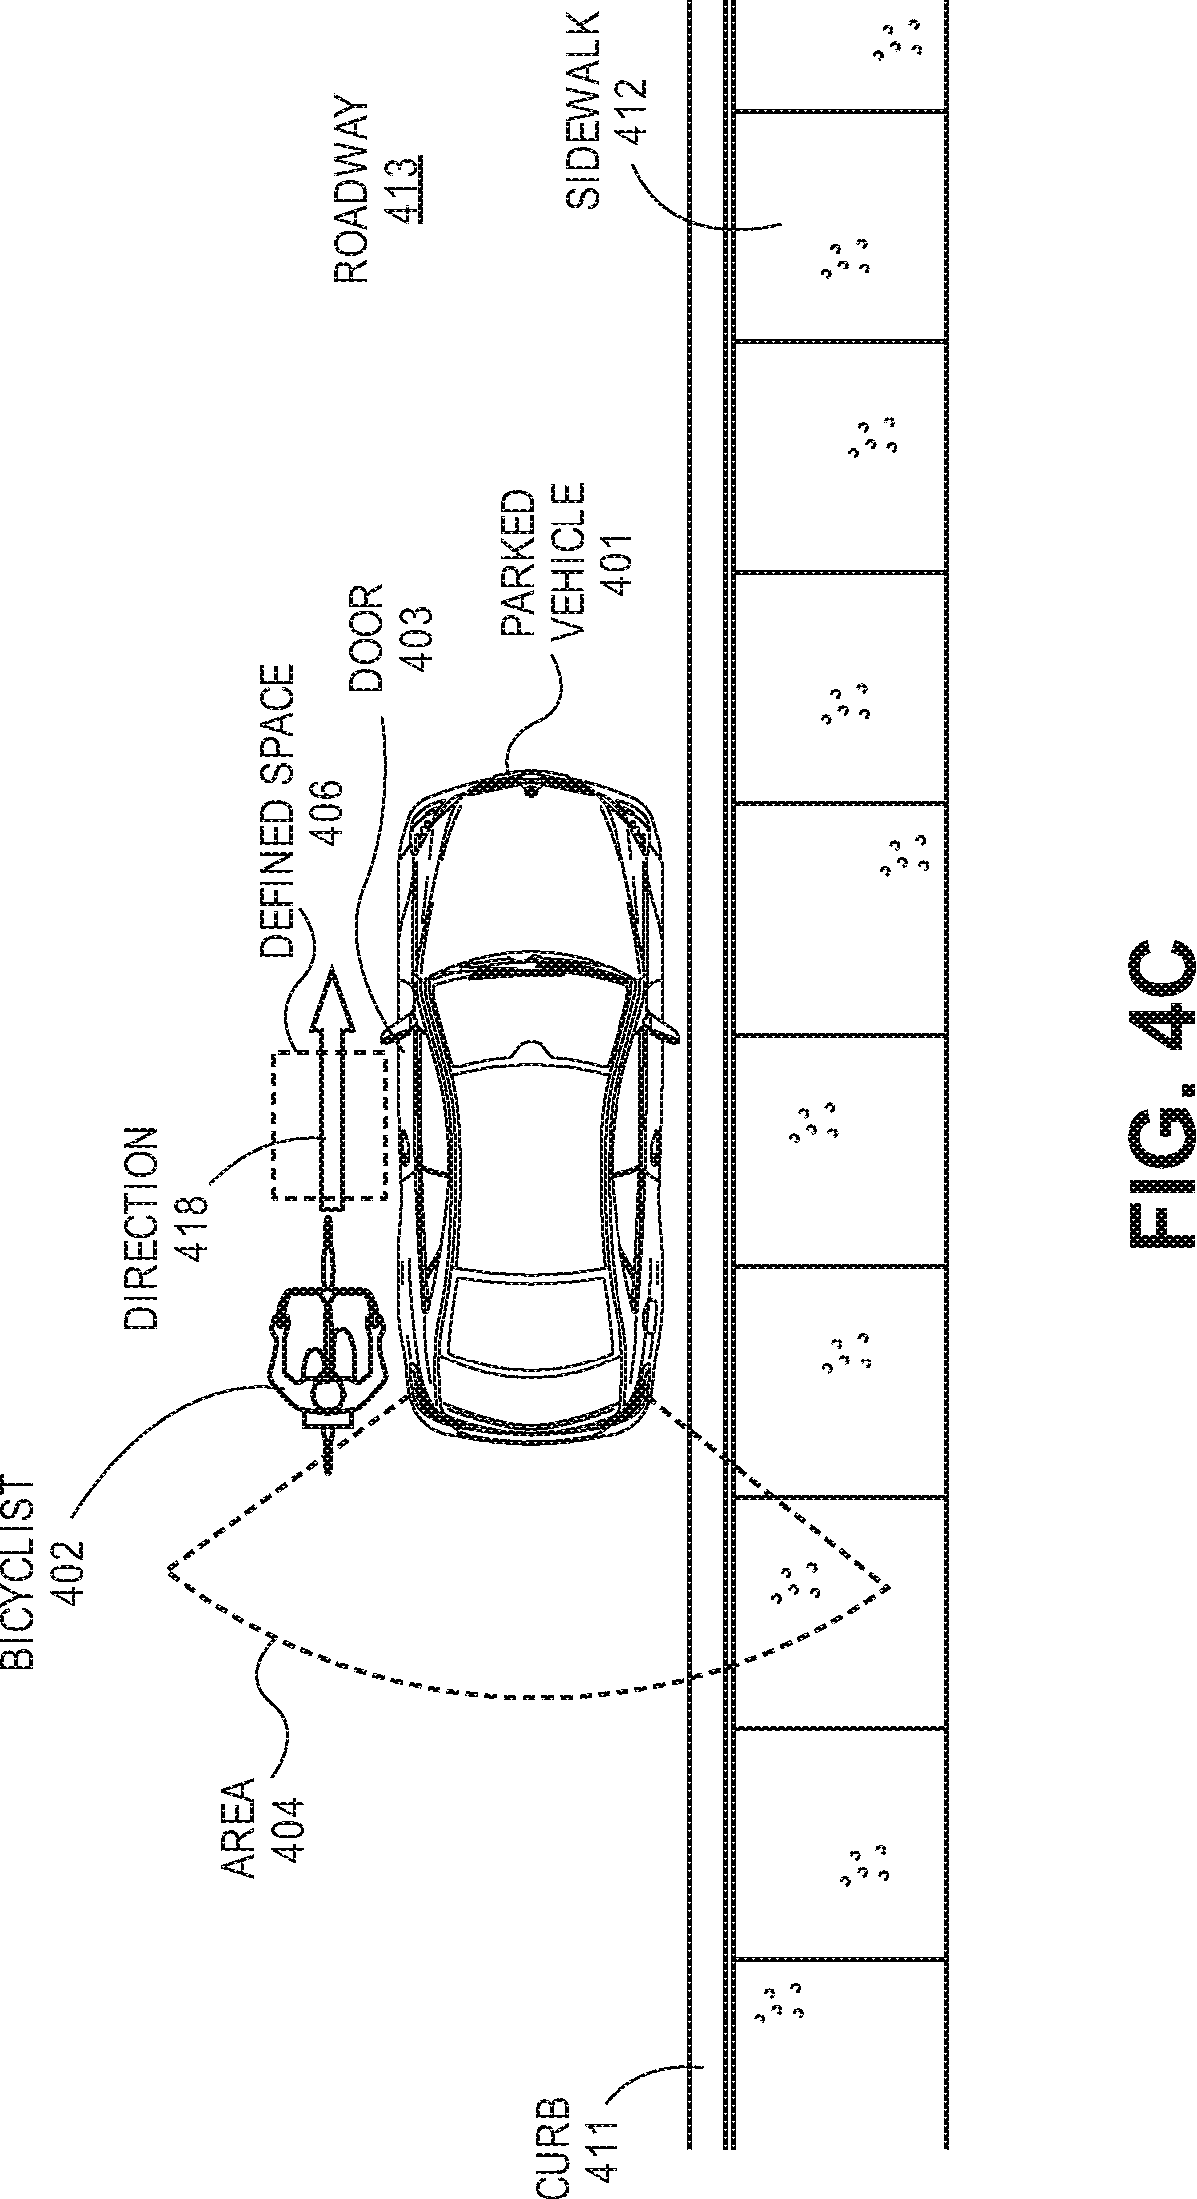 Figure GB2554123A_D0014